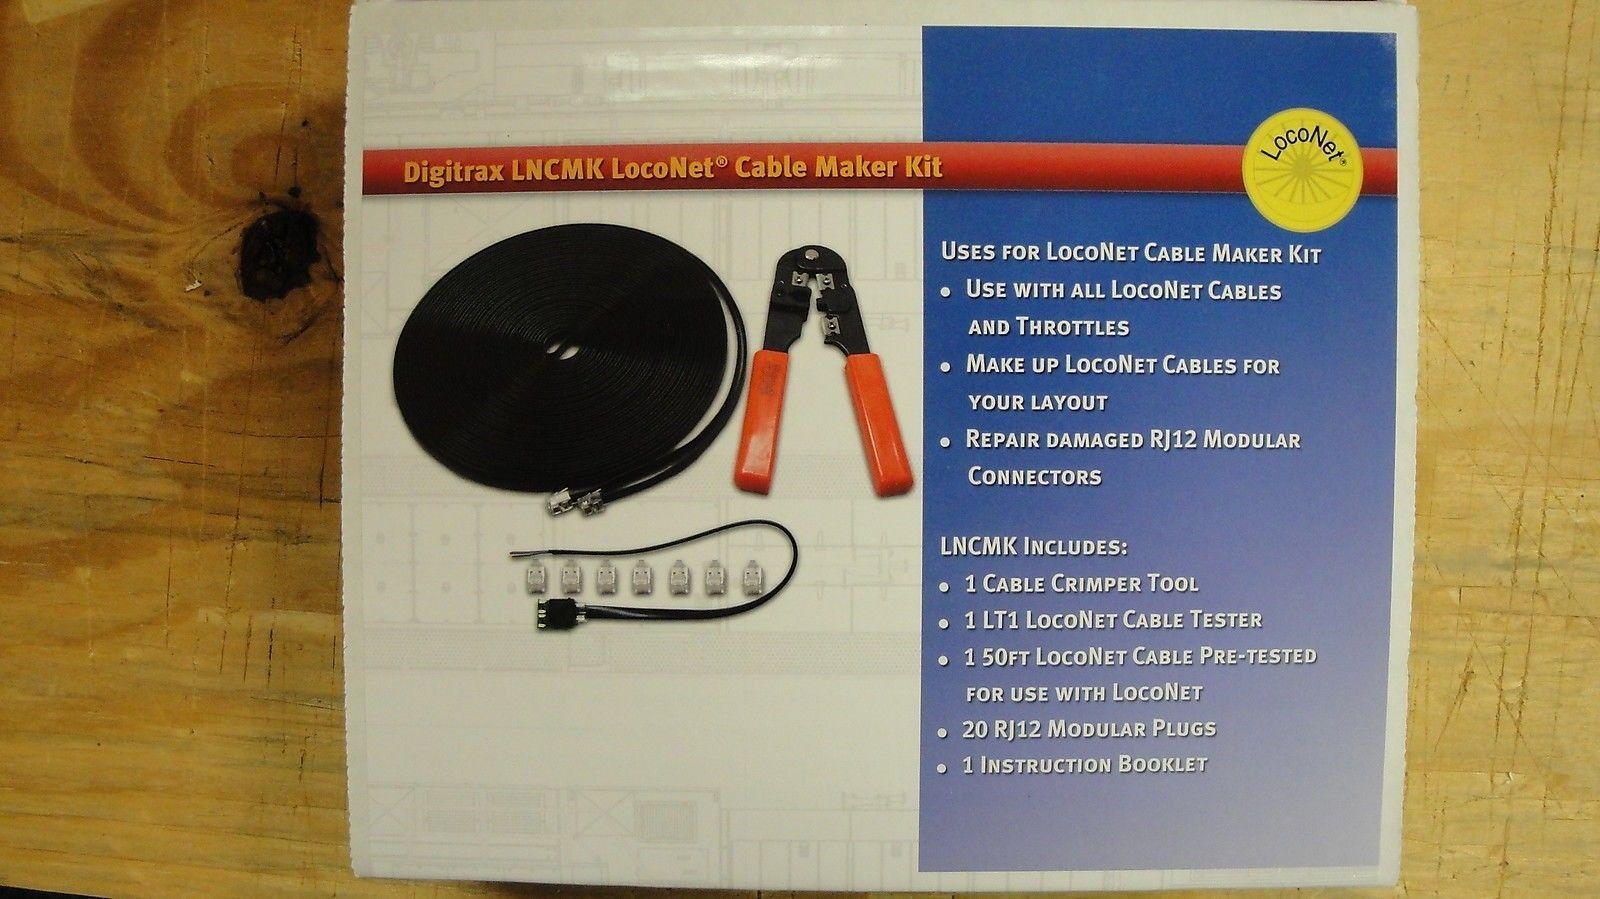 Digital Control Devices 158704 Digitrax Lncmk Lncmk Loconet Cable Maker Kit Yankeedabbler Buy It Now Only Kit Digital Cable